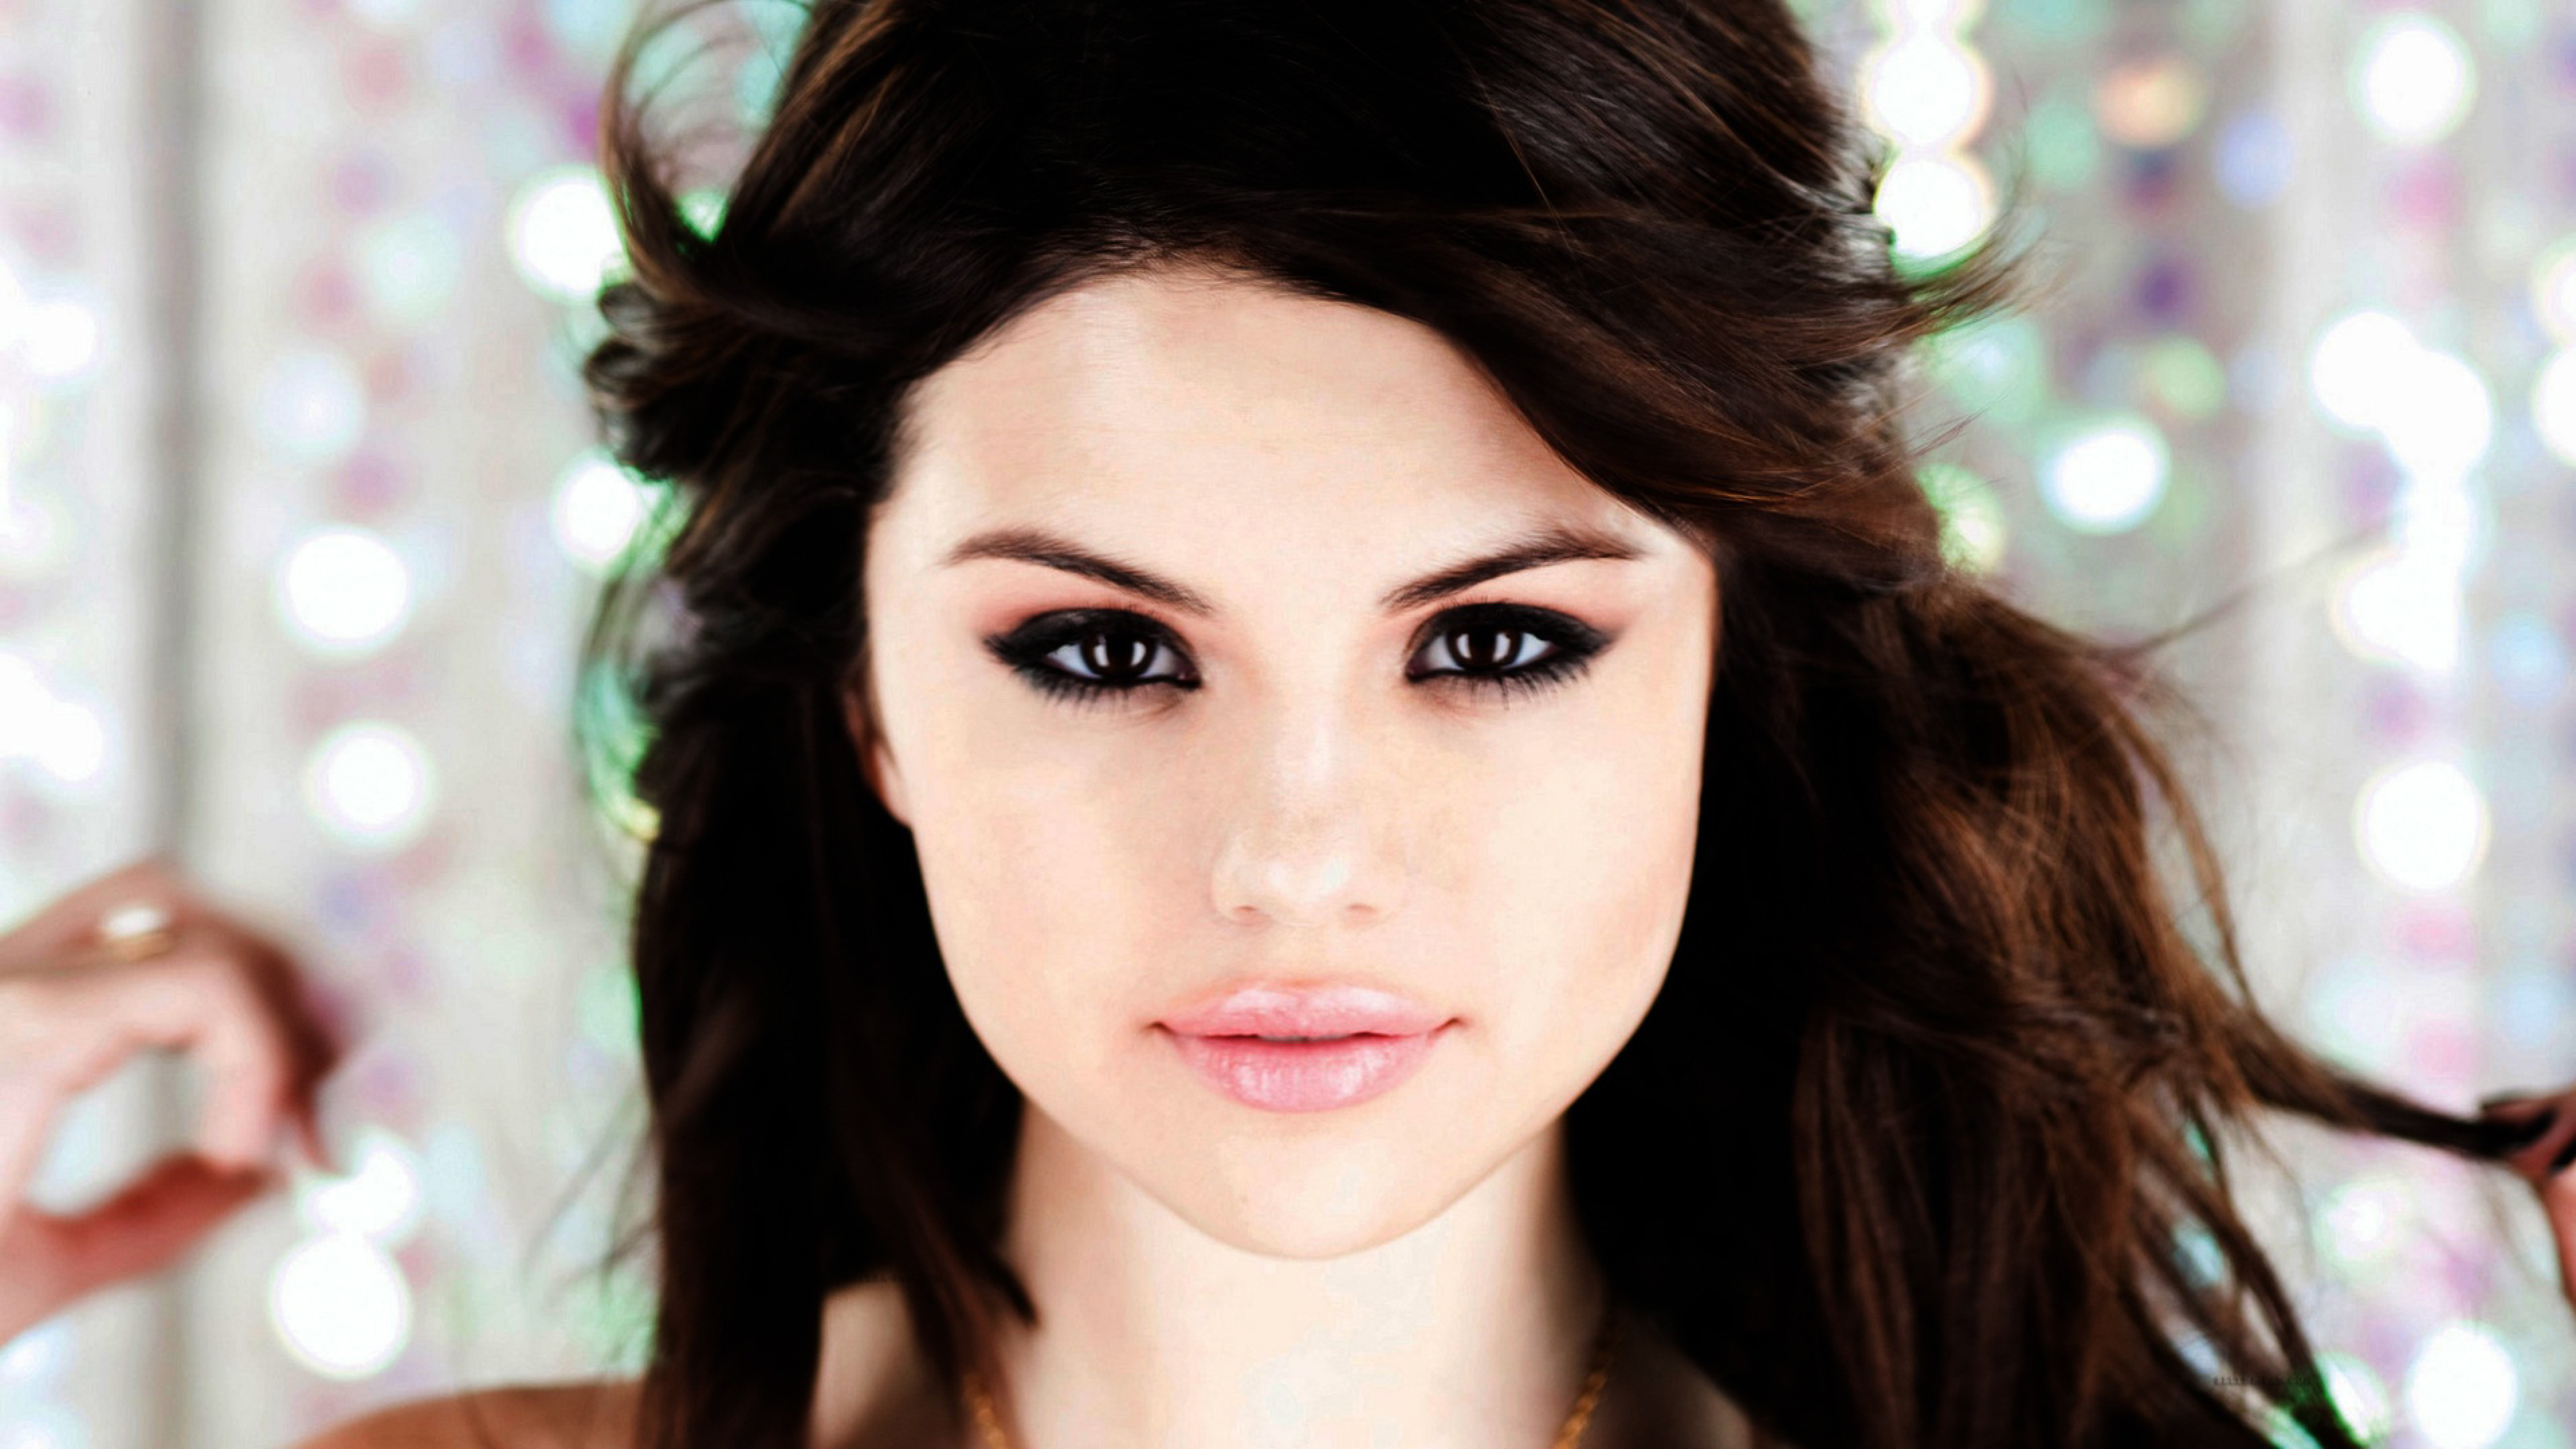 Selena gomez latest photoshoot full hd wallpaper - Selena gomez latest hd wallpapers ...